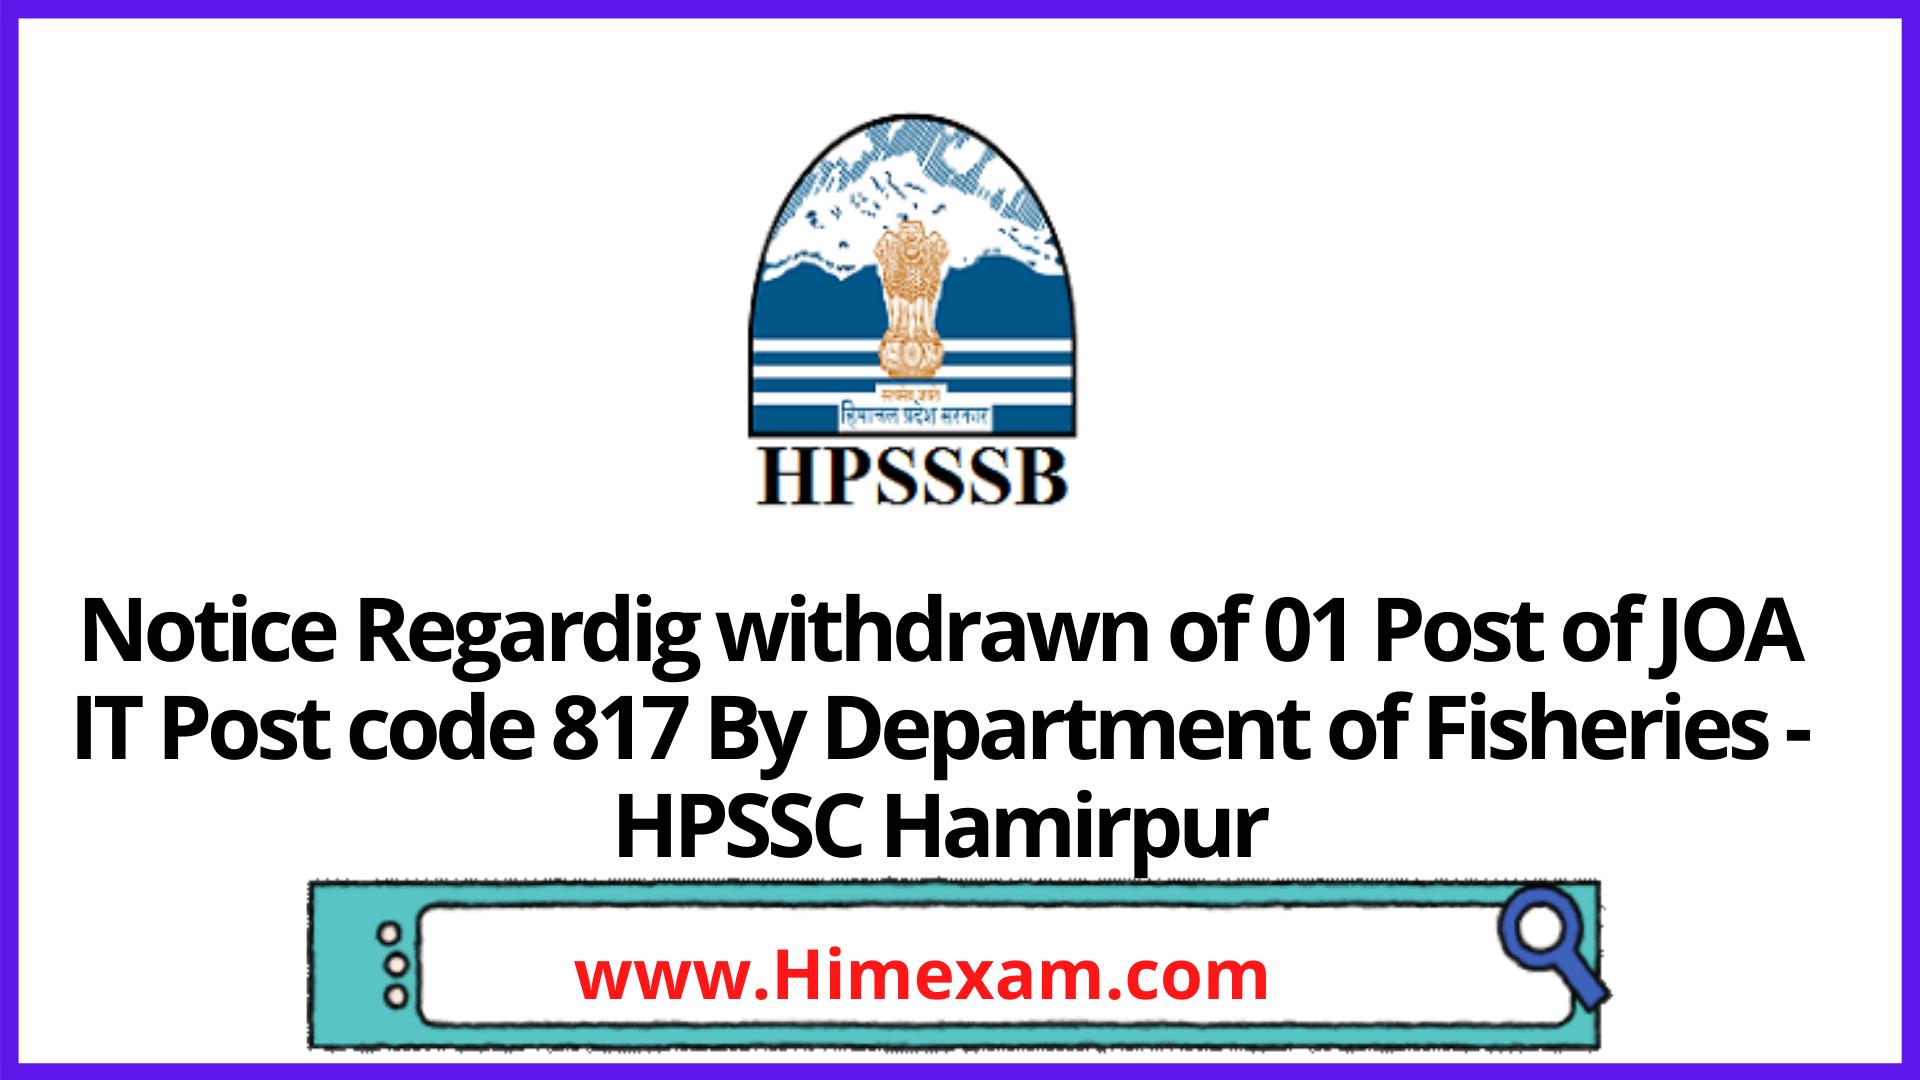 Notice Regardig withdrawn of 01 Post of JOA IT Post code 817 By Department of Fisheries -HPSSC Hamirpur